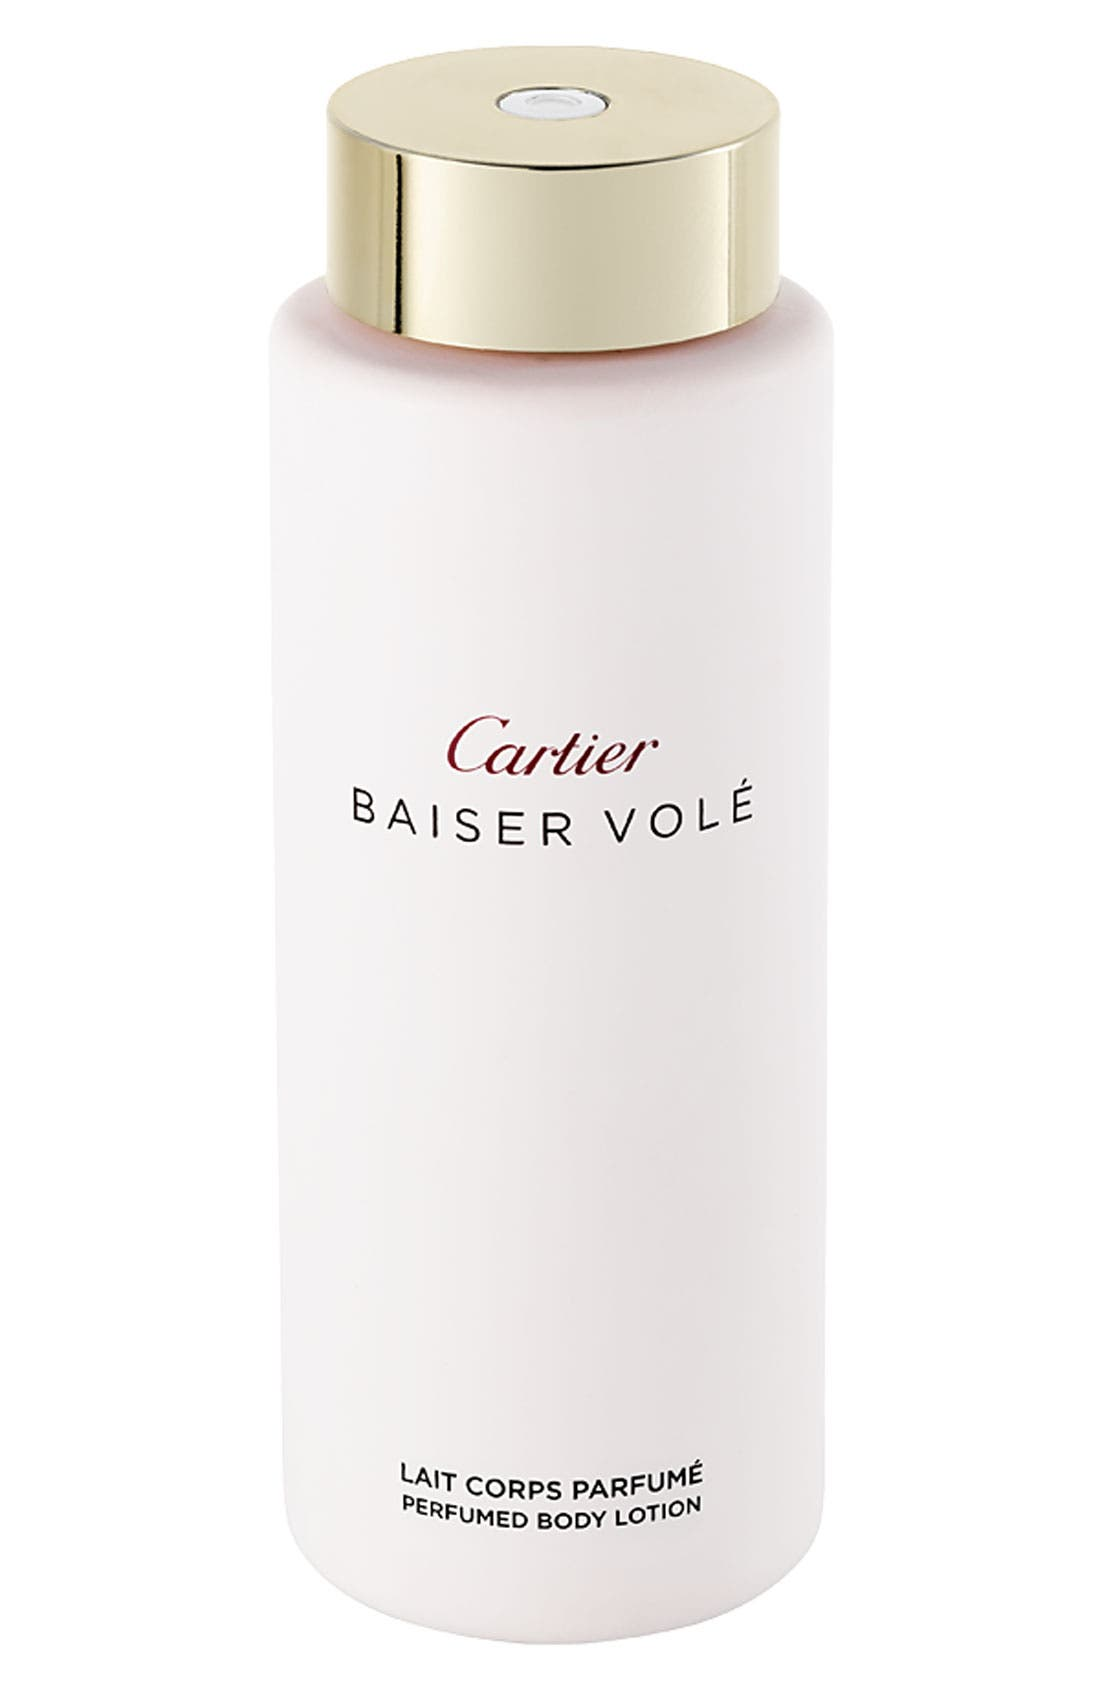 Cartier 'Baiser Volé' Perfumed Body Lotion